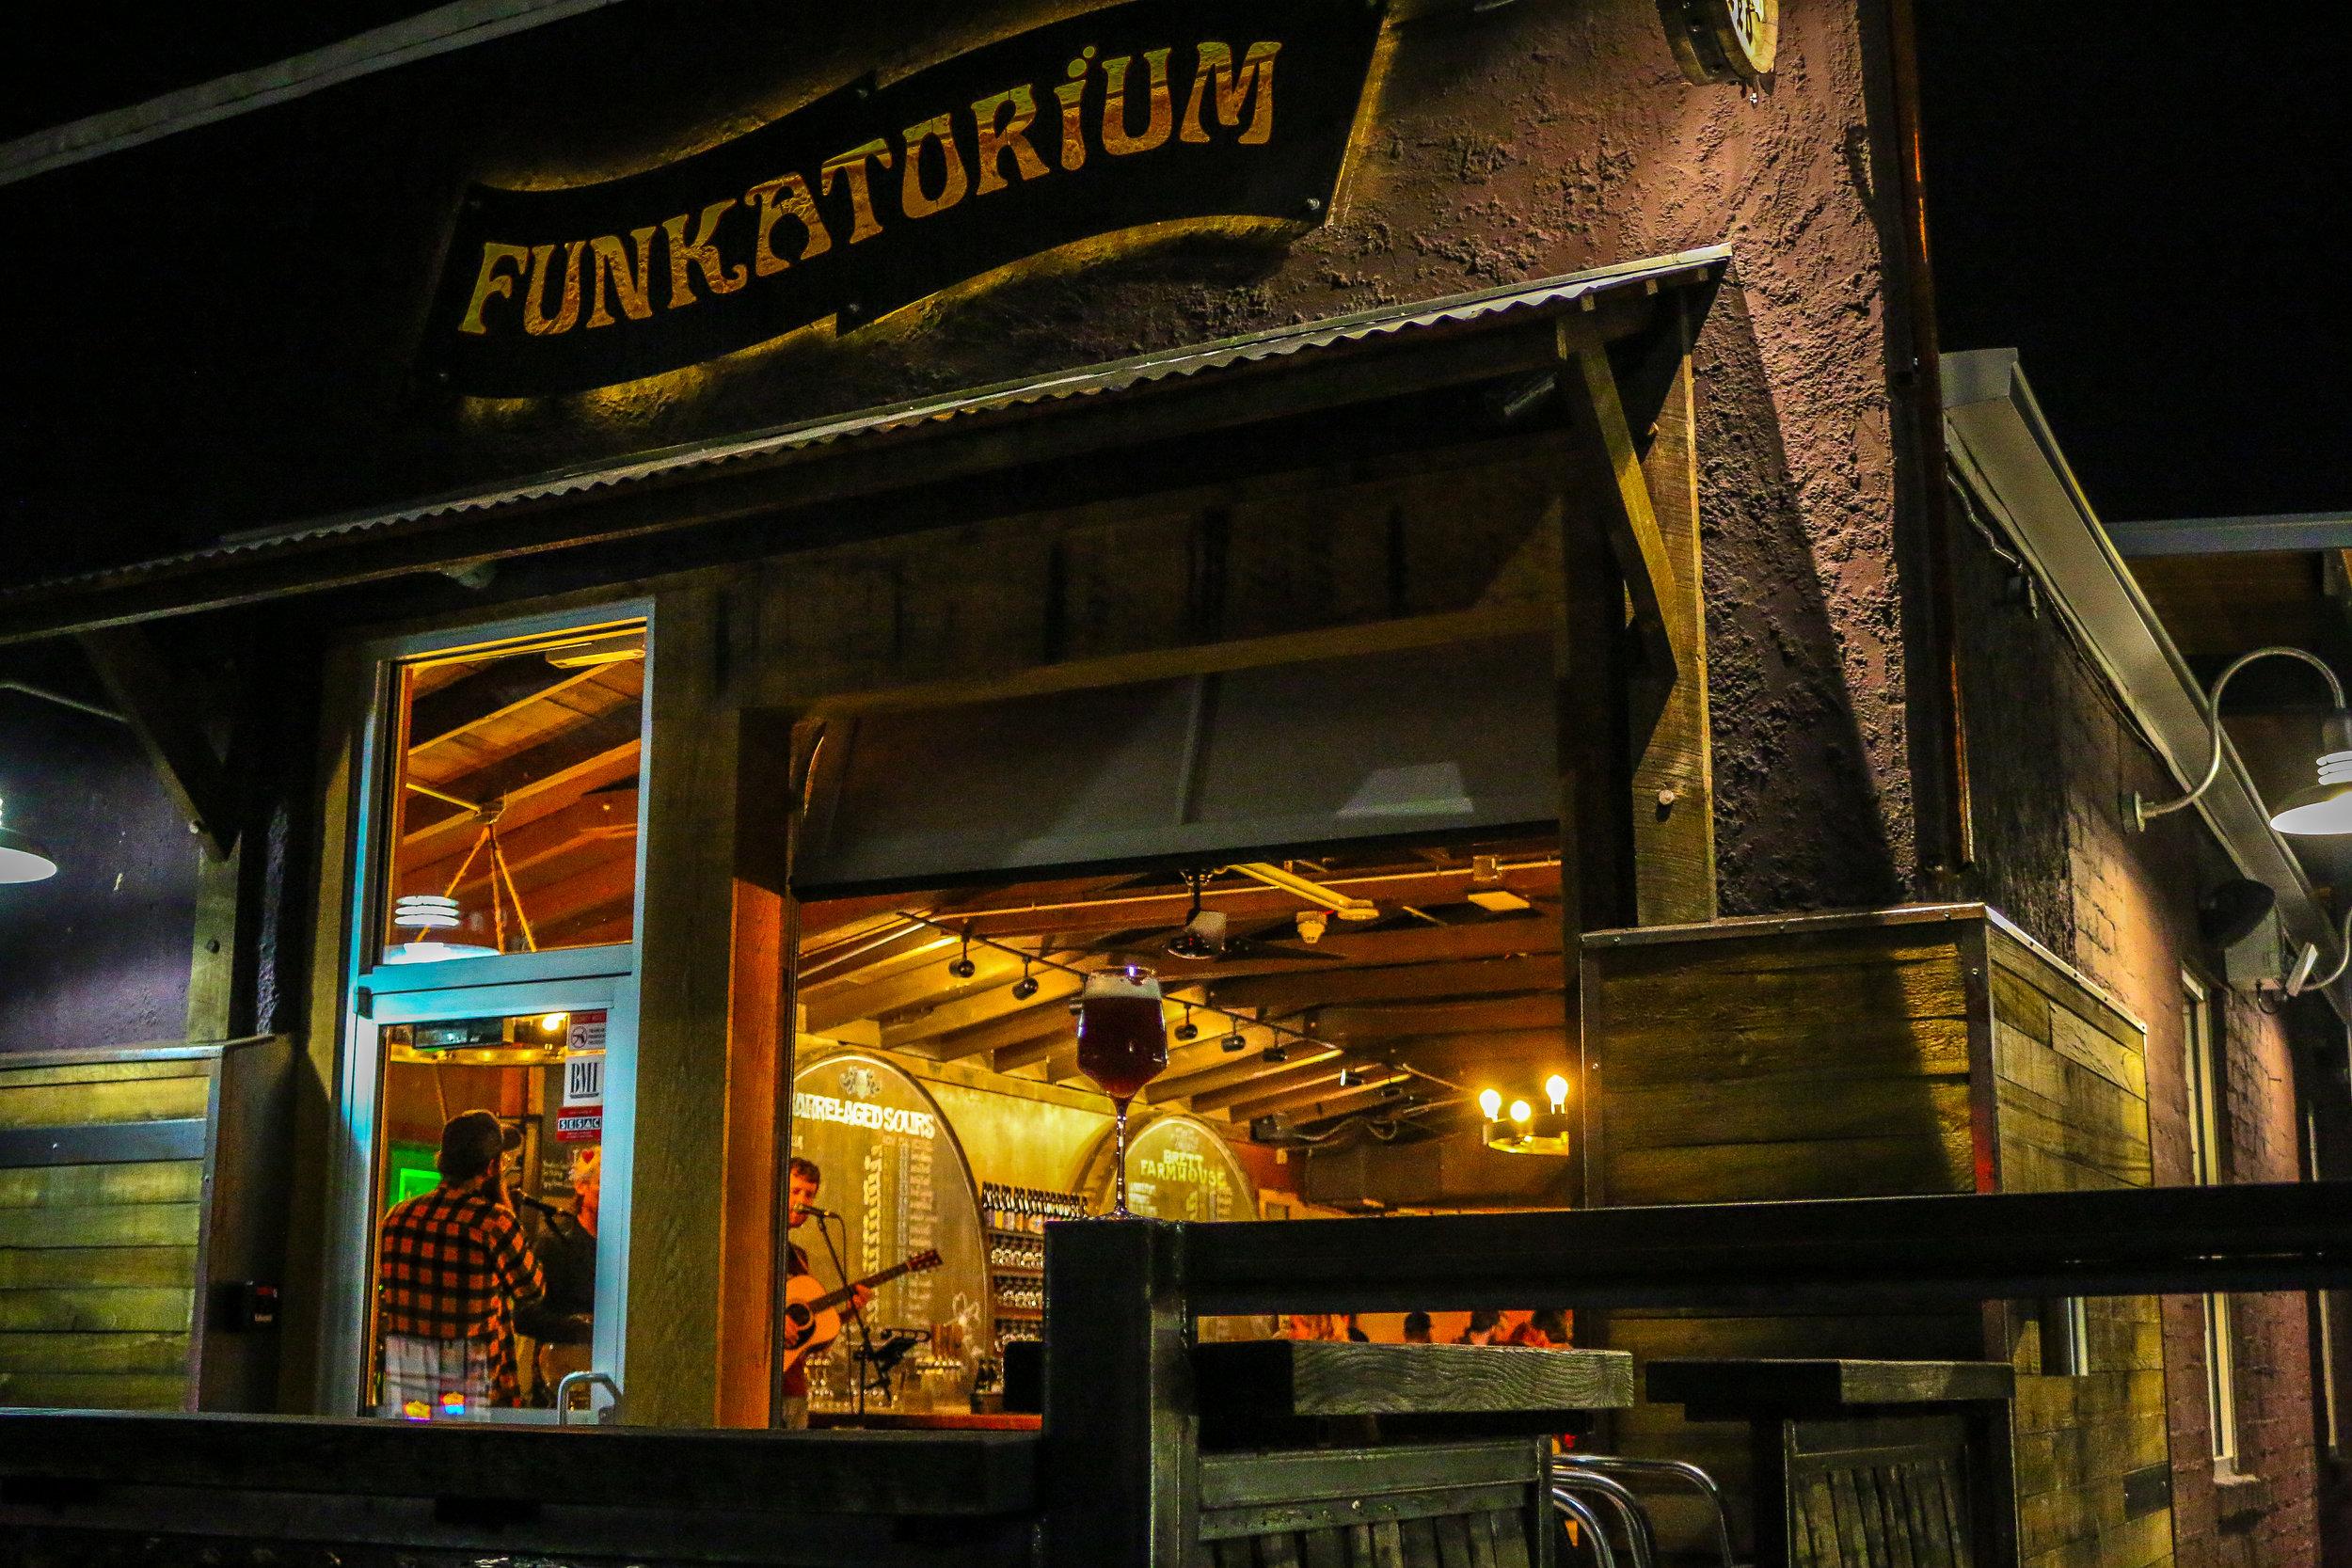 Oblivion at Funkatorium